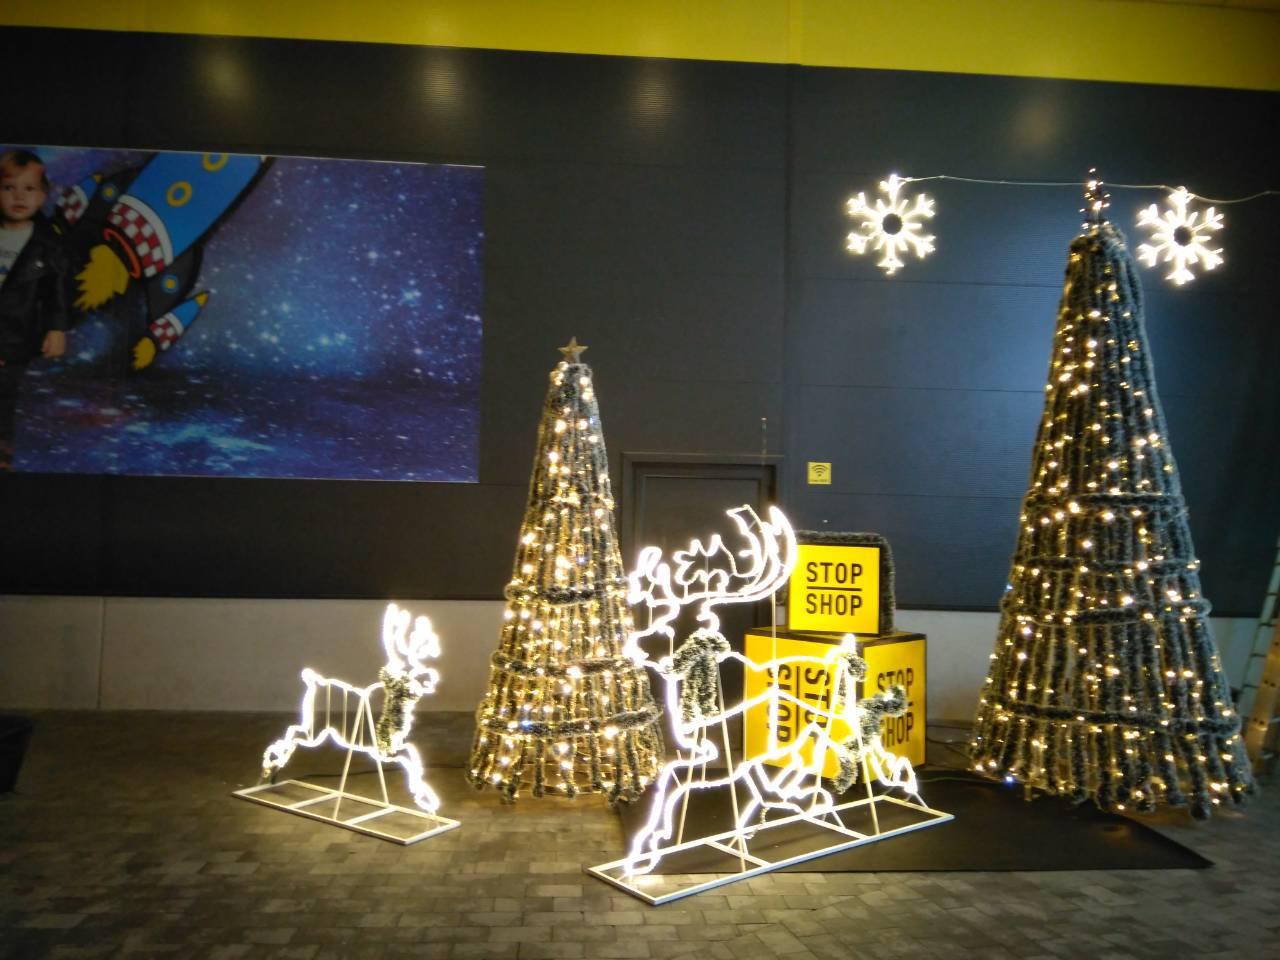 led-novogodisnja-rasveta